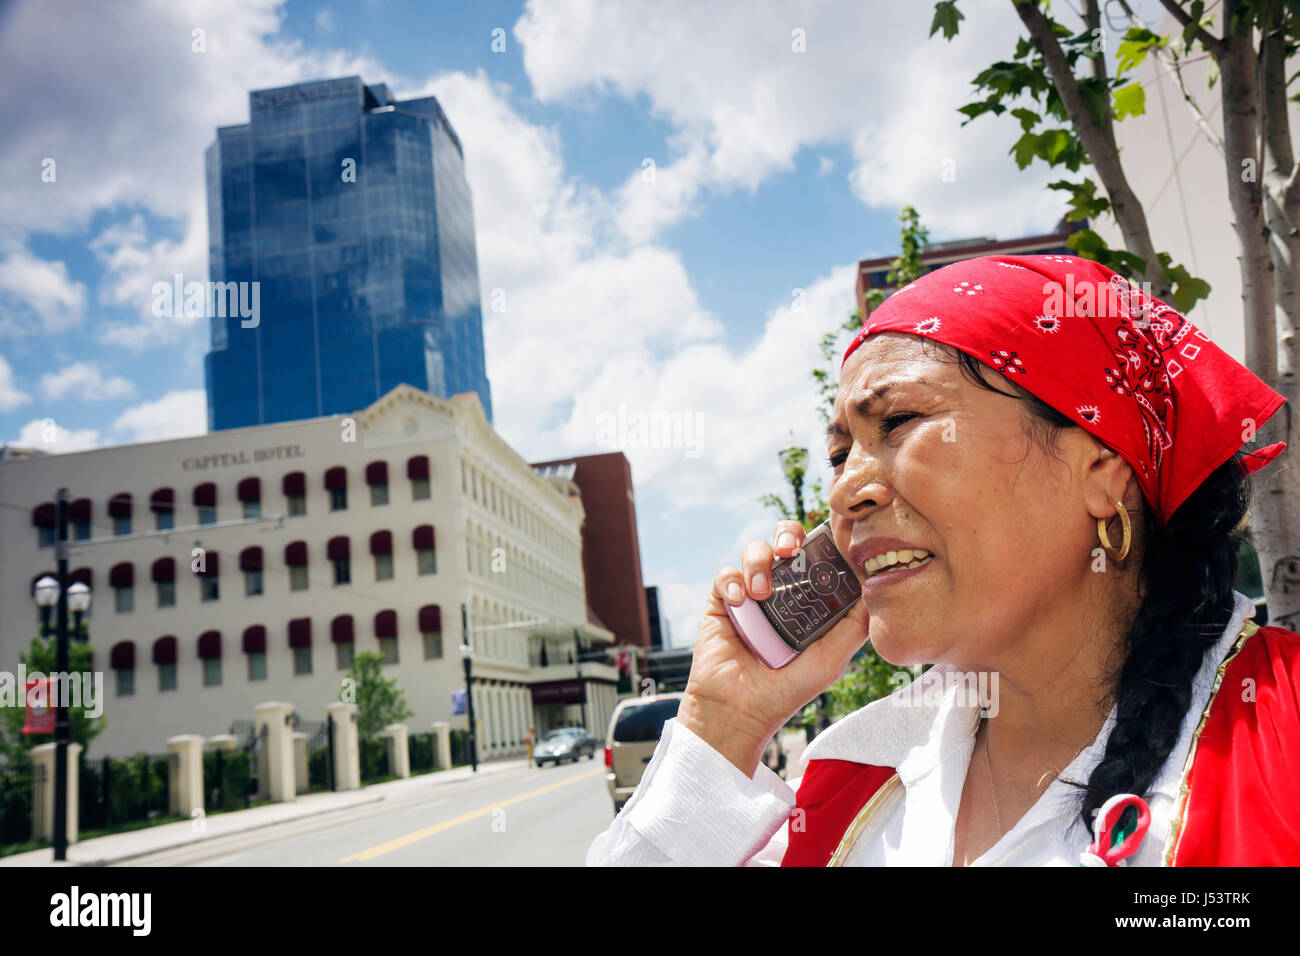 Little Rock Arkansas Markham Street Mexican performer mobile cell phone Hispanic woman costume red bandana speak - Stock Image